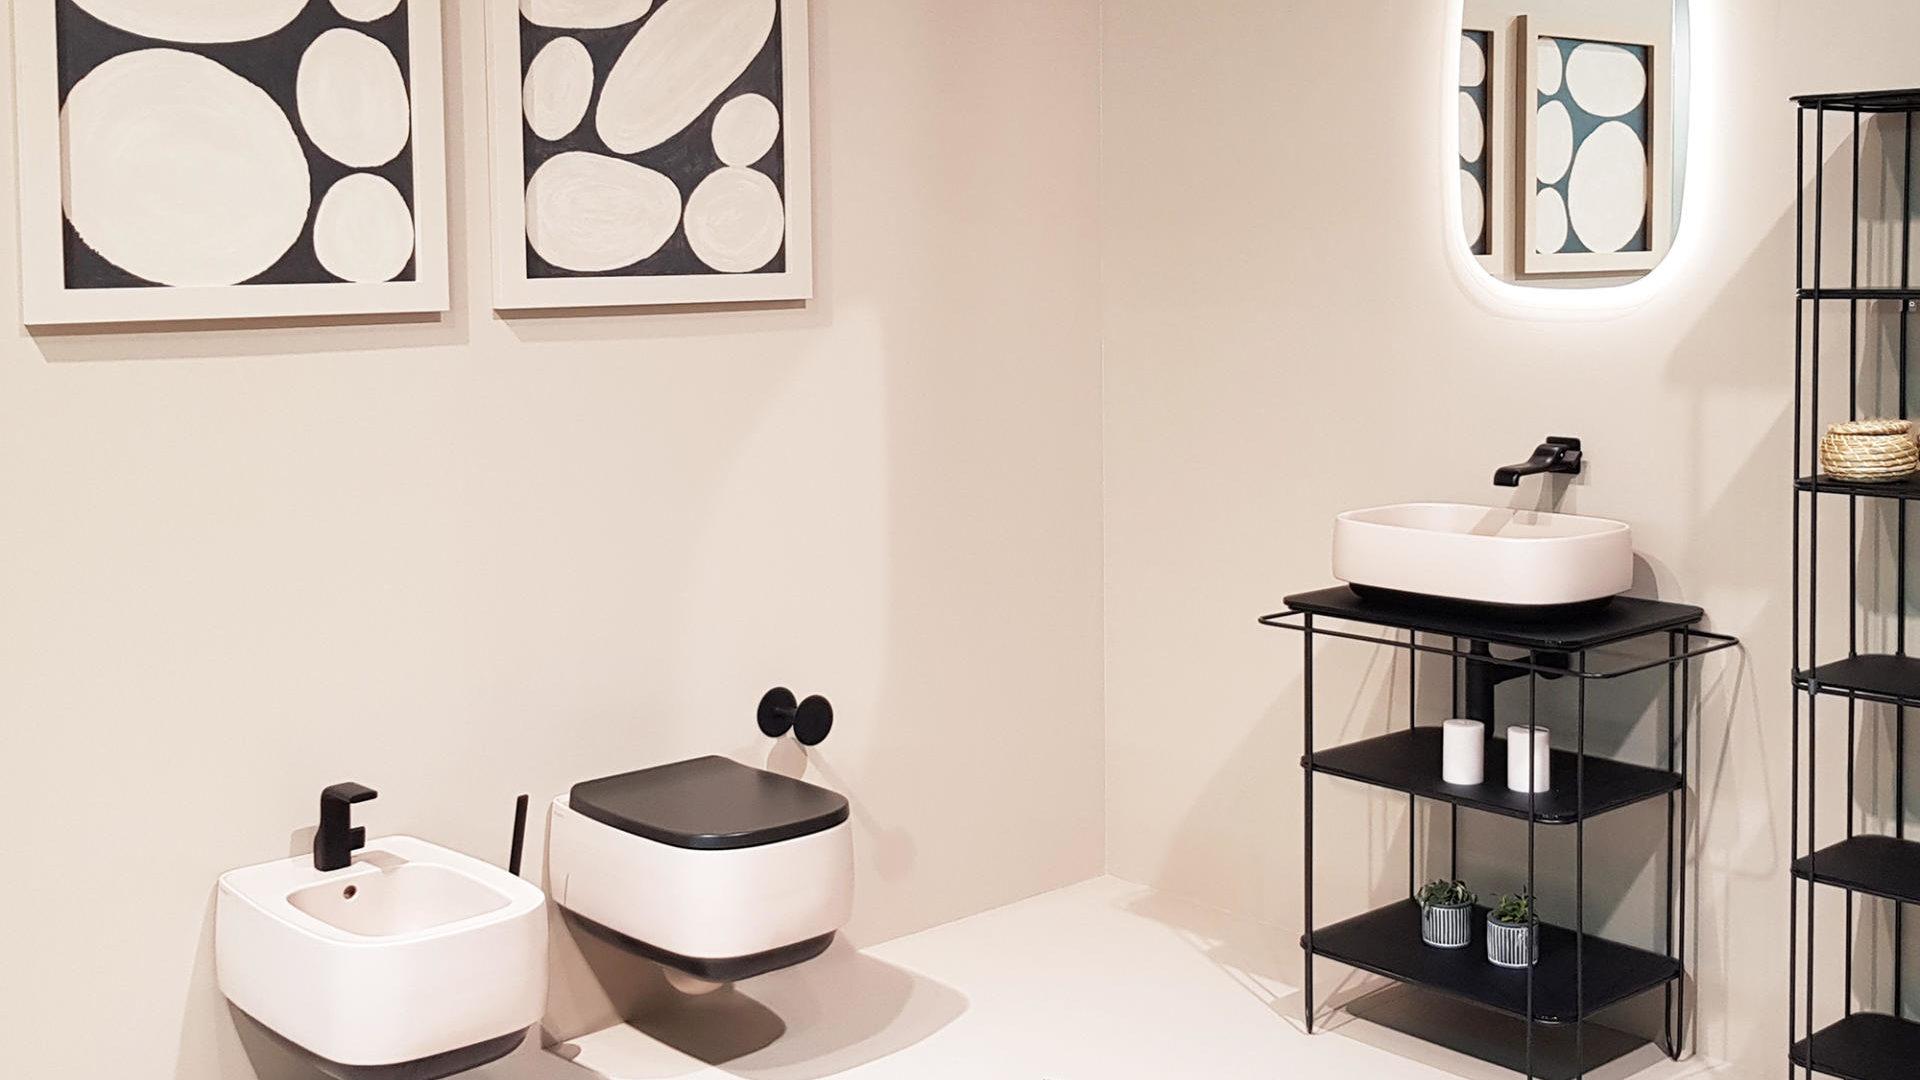 Sanitari e lavabo bicolor